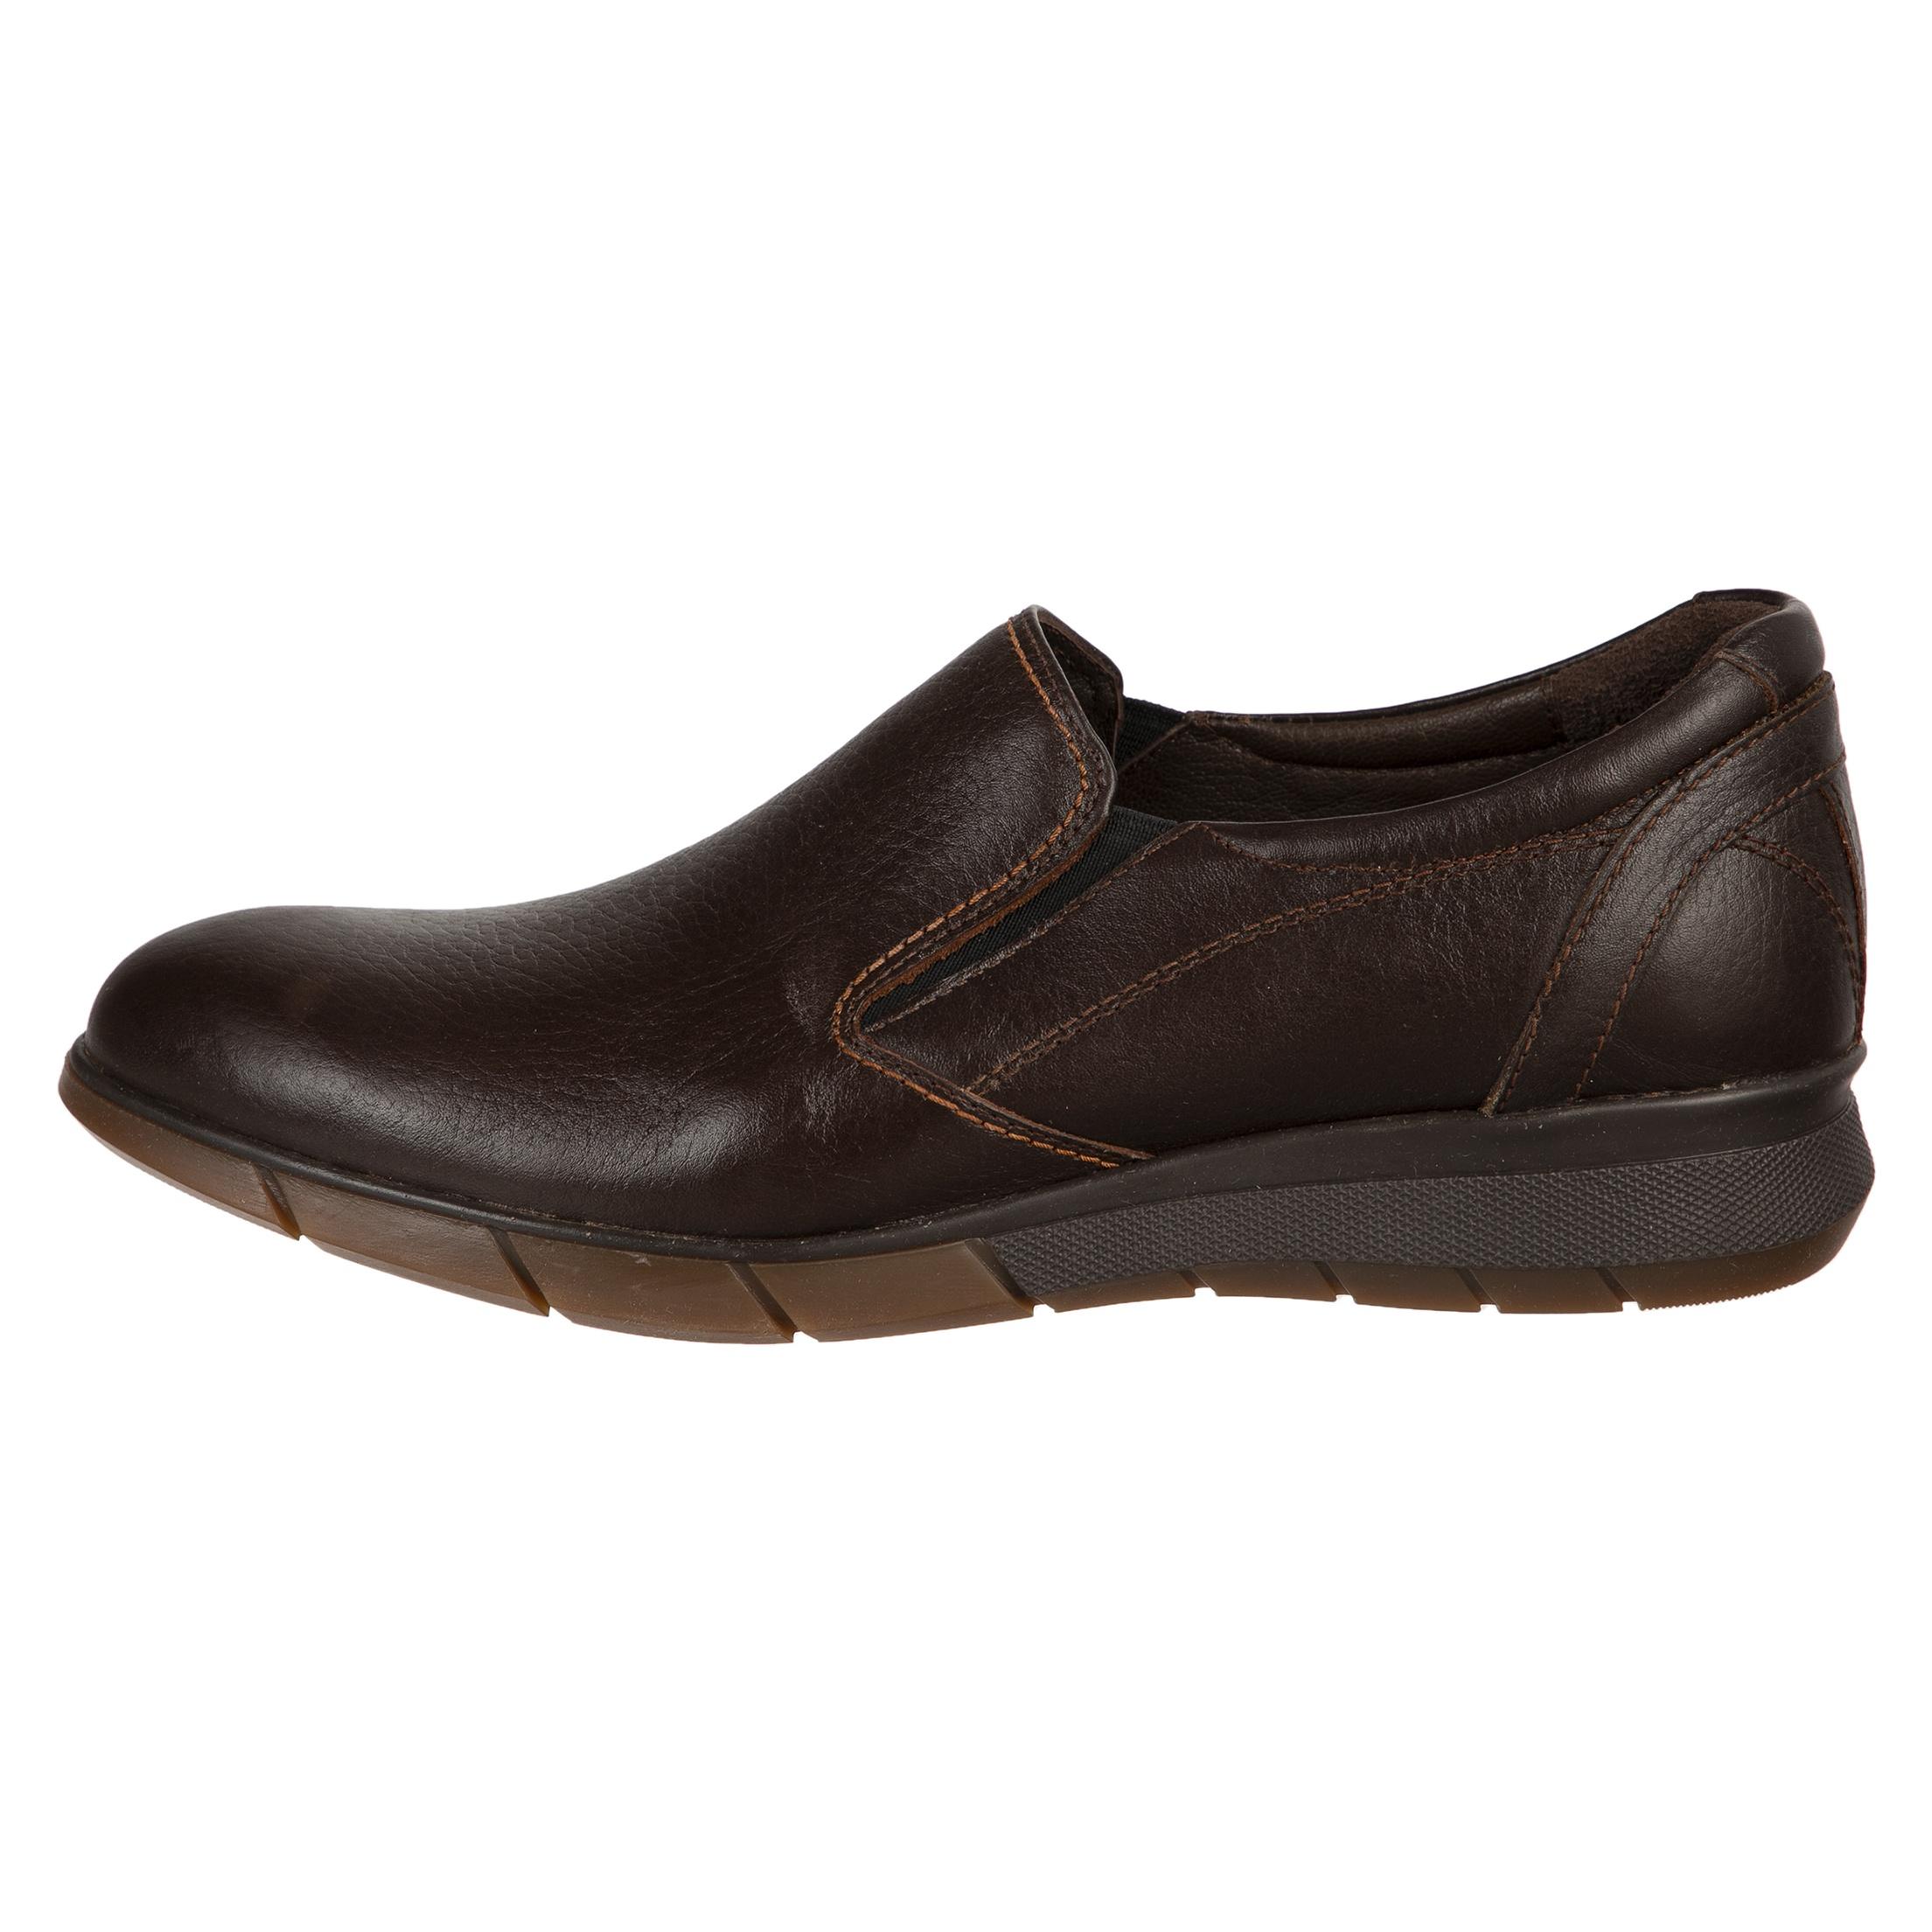 کفش روزمره مردانه دانادل مدل 7001W503104